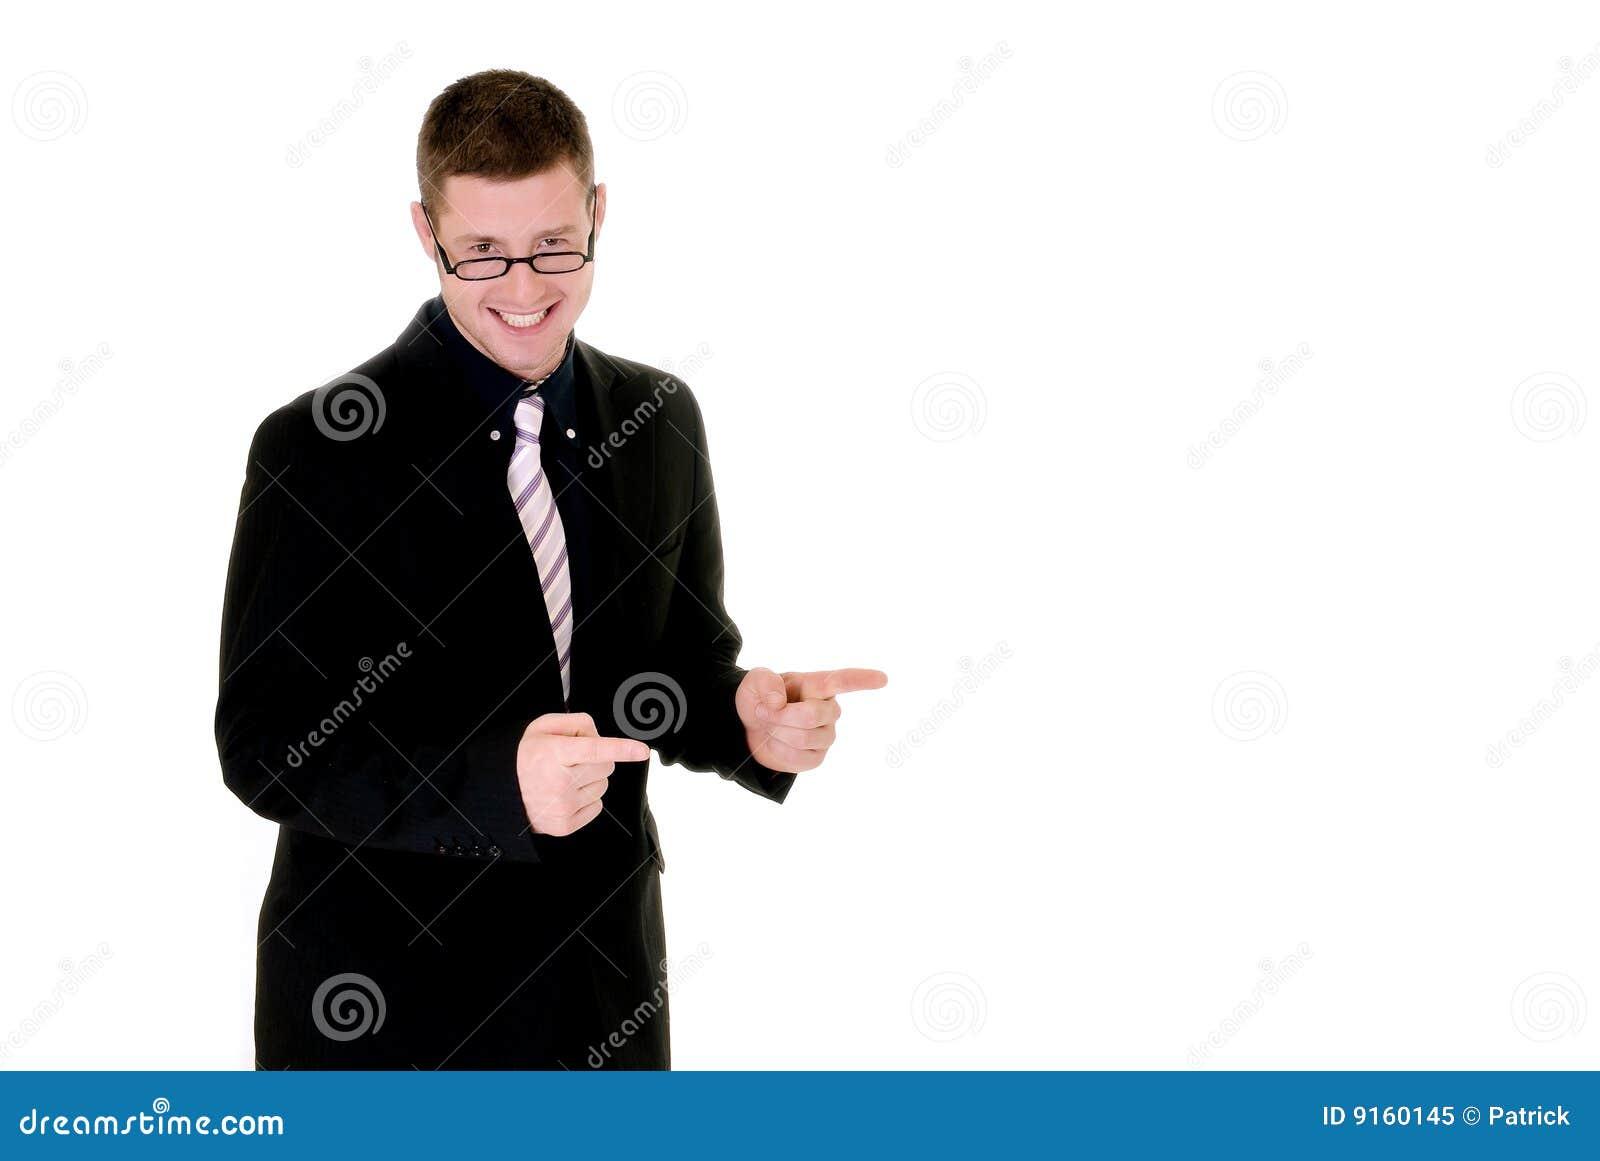 Successful businessmanHandsome Businessman Successful